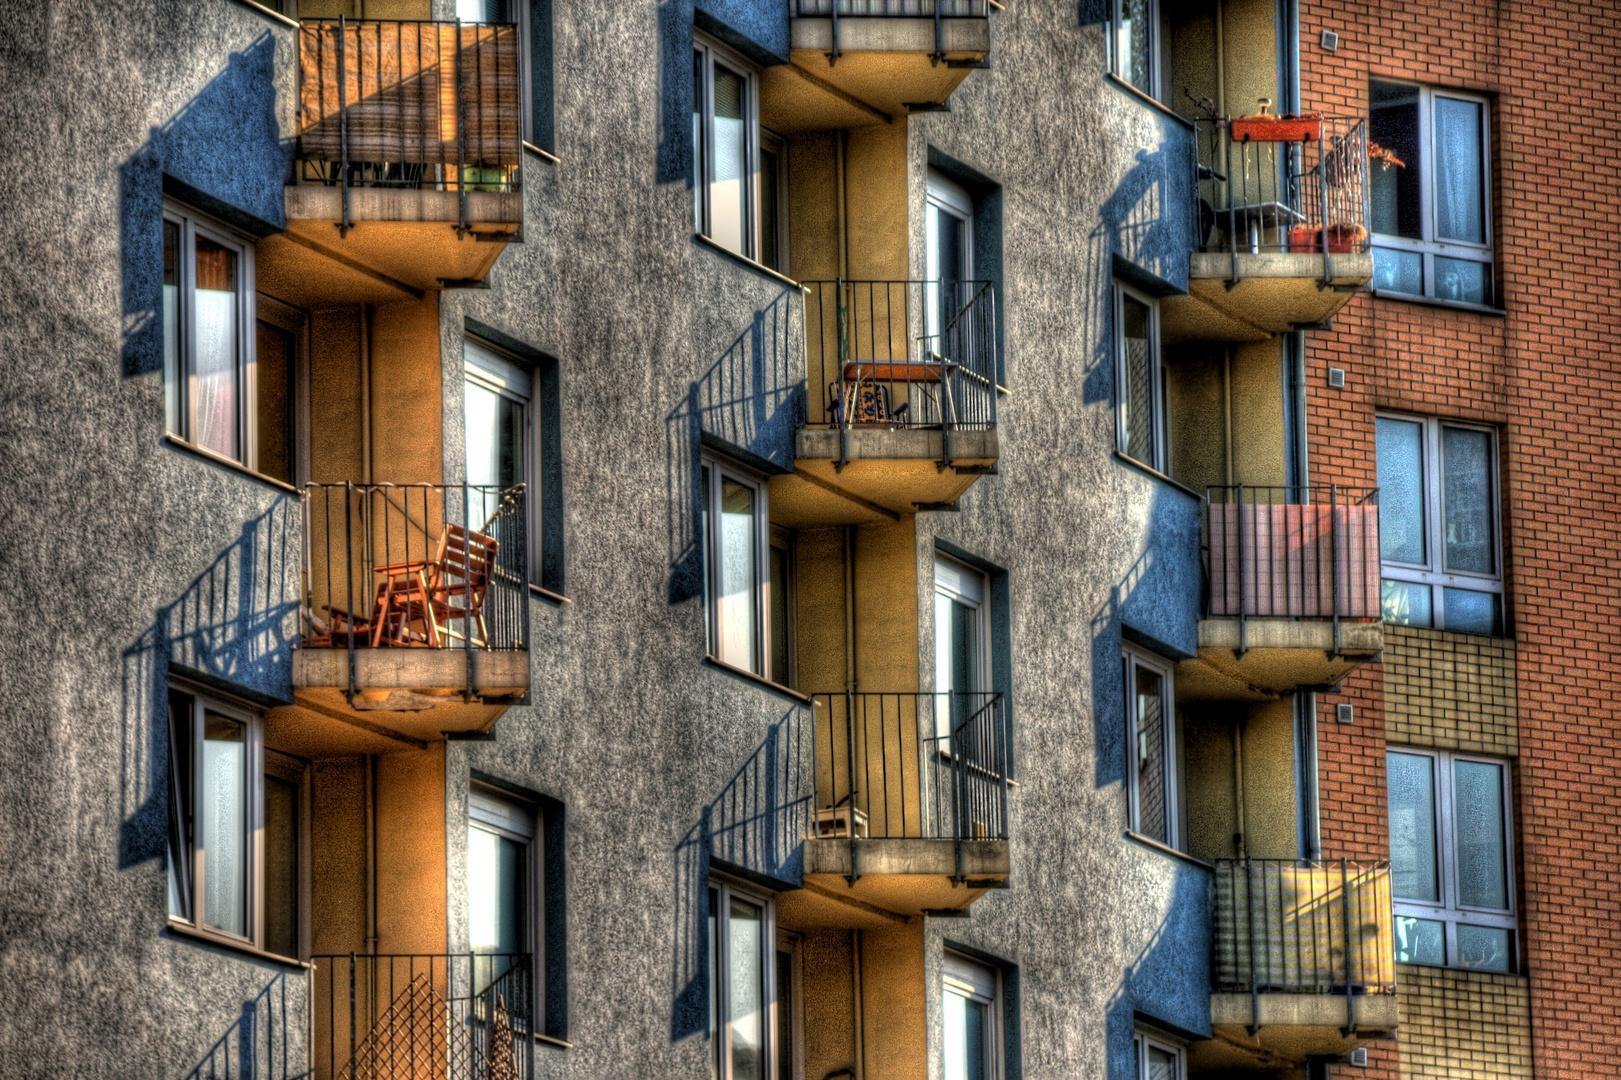 Balkonien [HDRi]